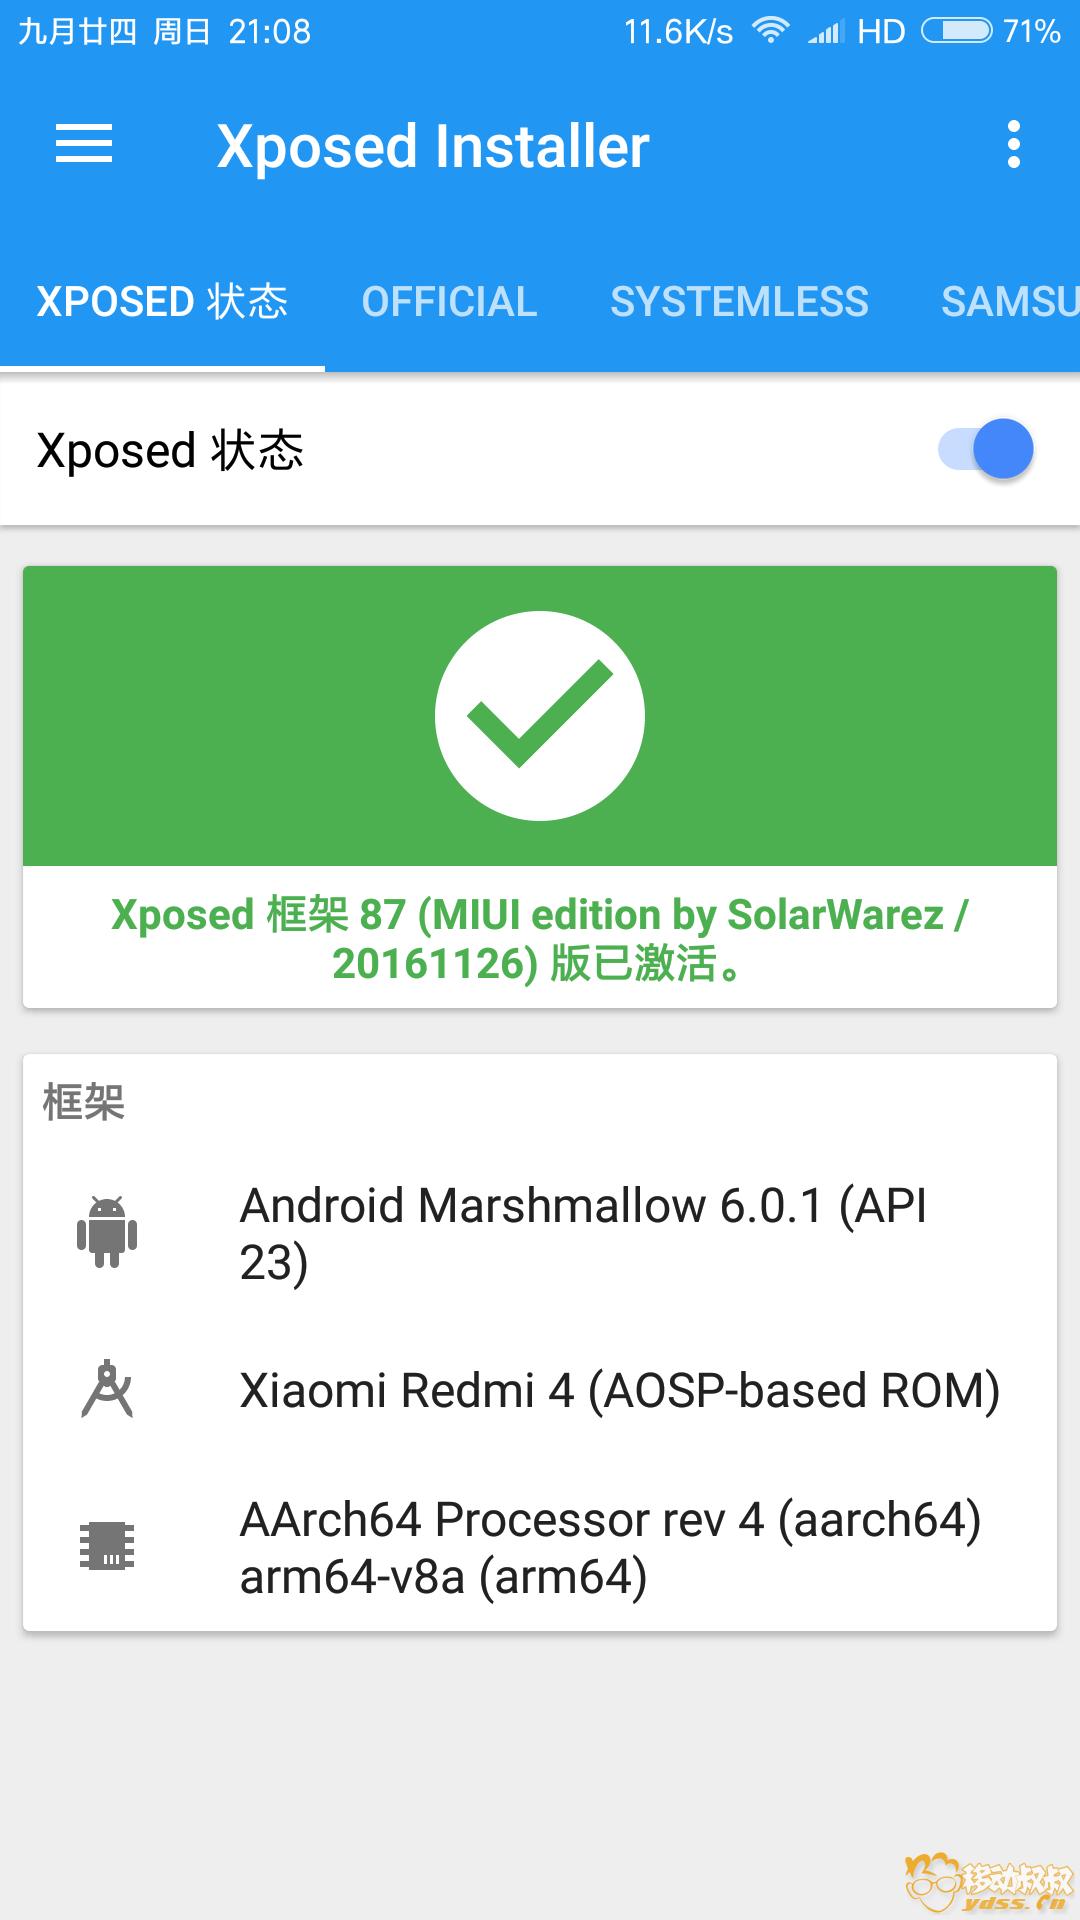 Screenshot_2017-11-12-21-08-40-288_de.robv.android.xposed.installer.png